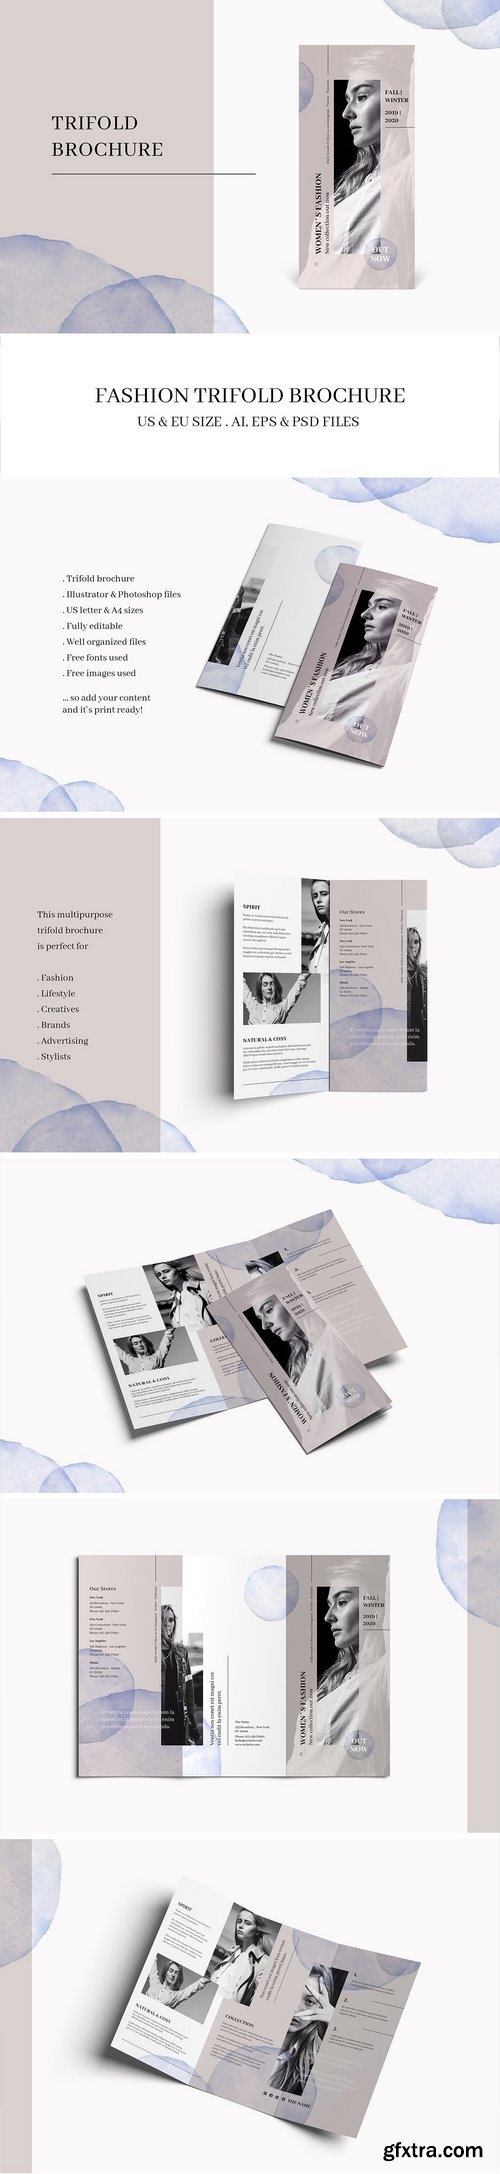 CM - FASHION Trifold Brochure 1840588